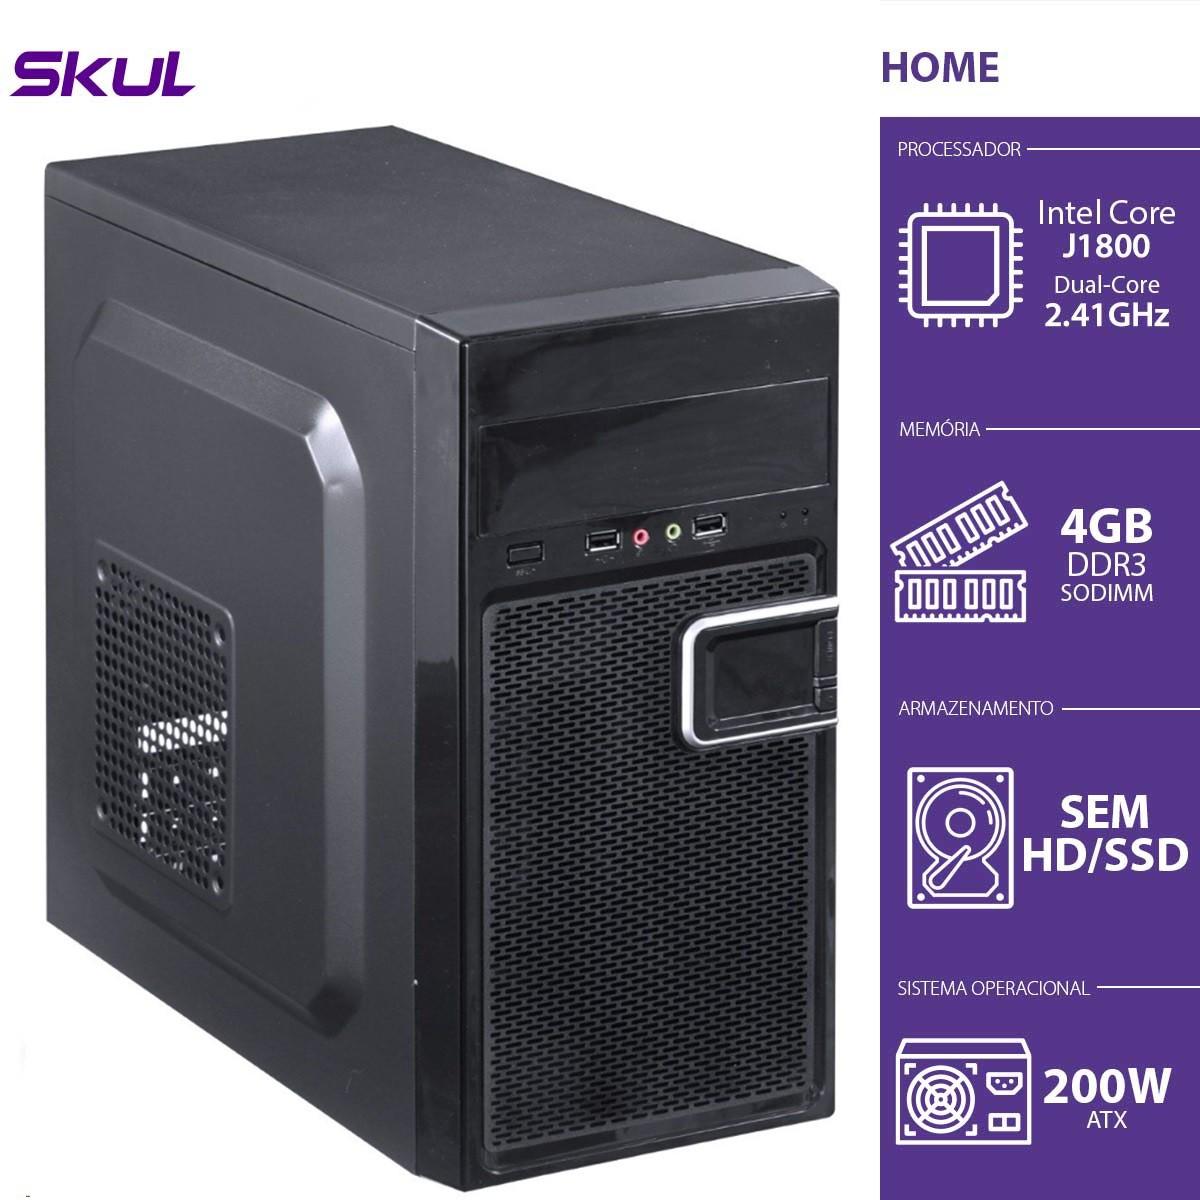 Computador Home H100 - Celeron Dual Core J1800 2.41GHZ 4GB DDR3 Sodimm sem HD/SSD HDMI/VGA Fonte 200W - HJ18004